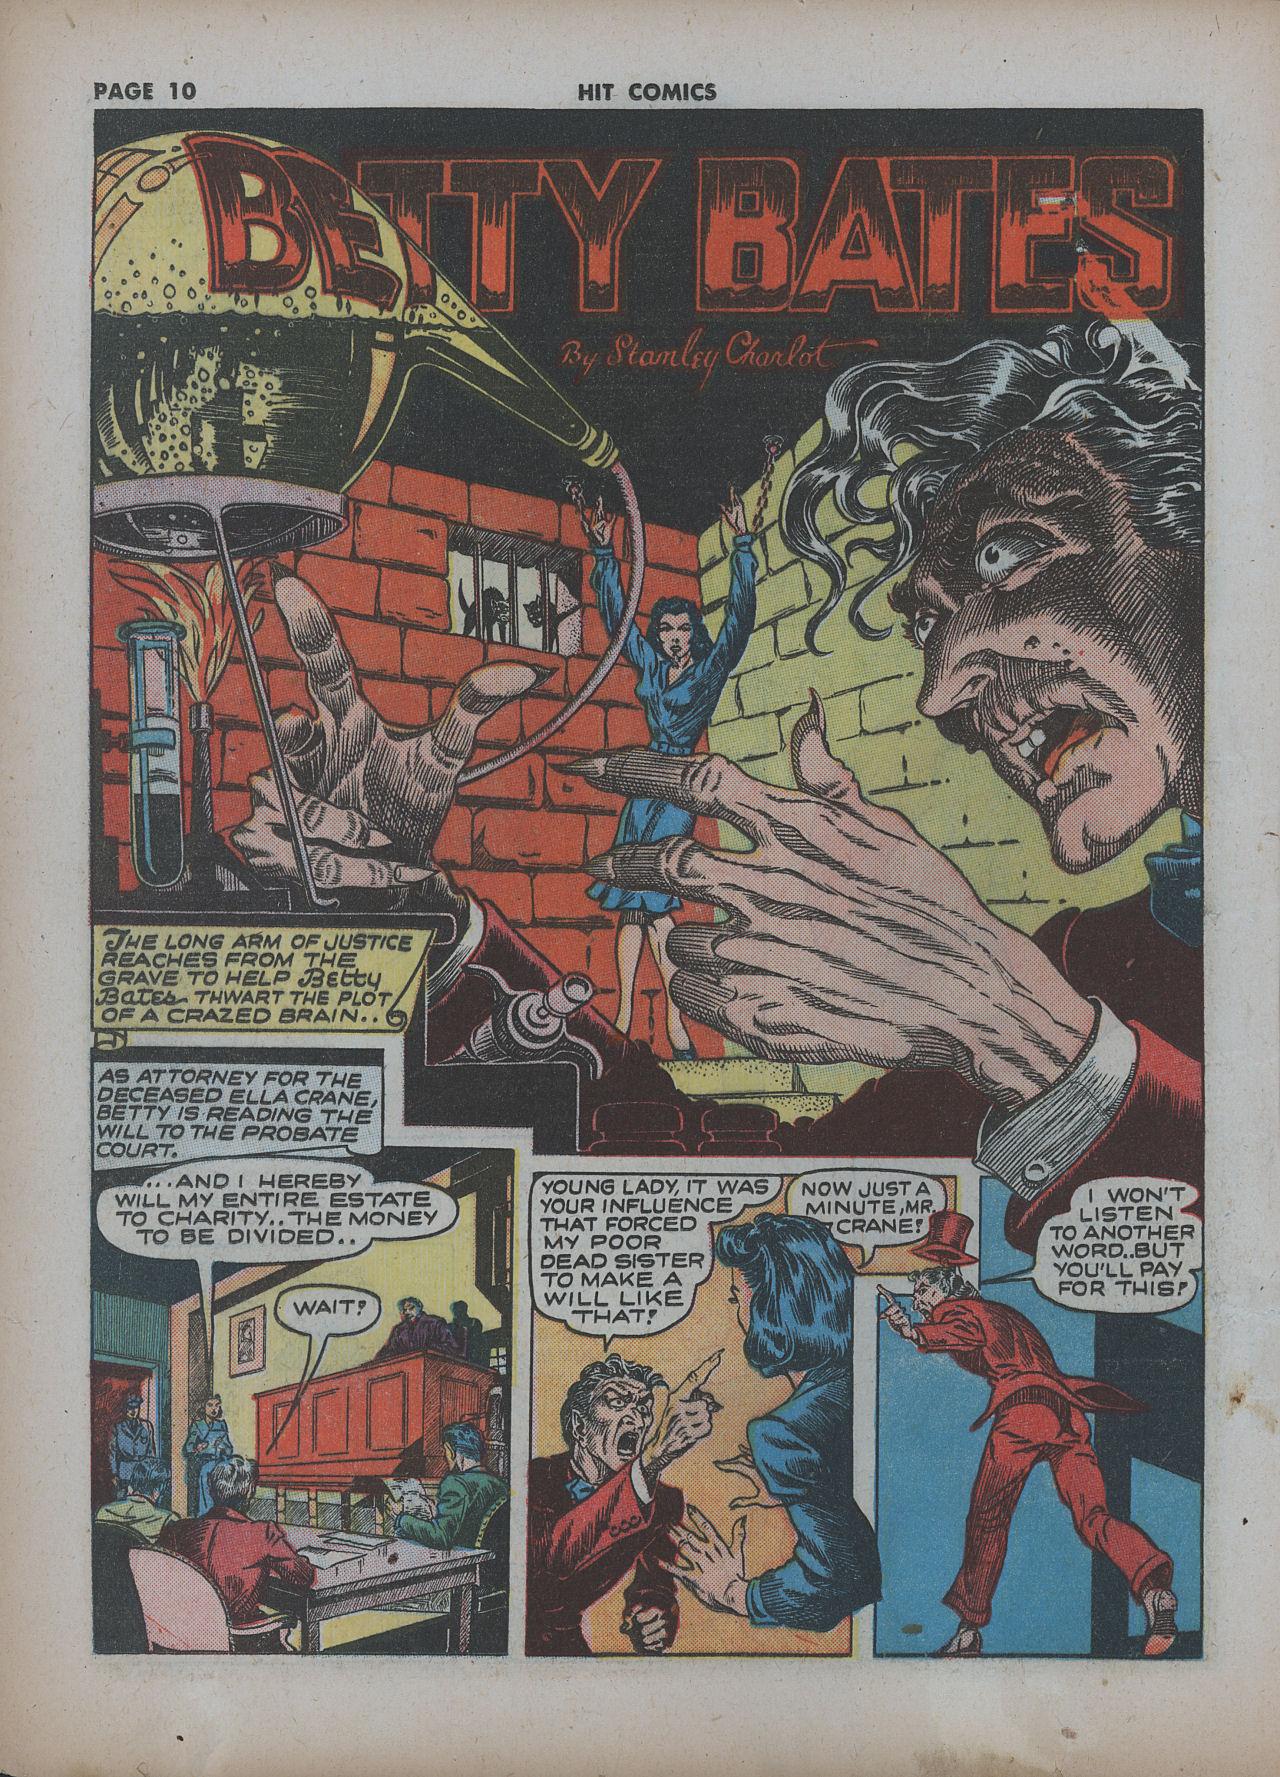 Read online Hit Comics comic -  Issue #22 - 12